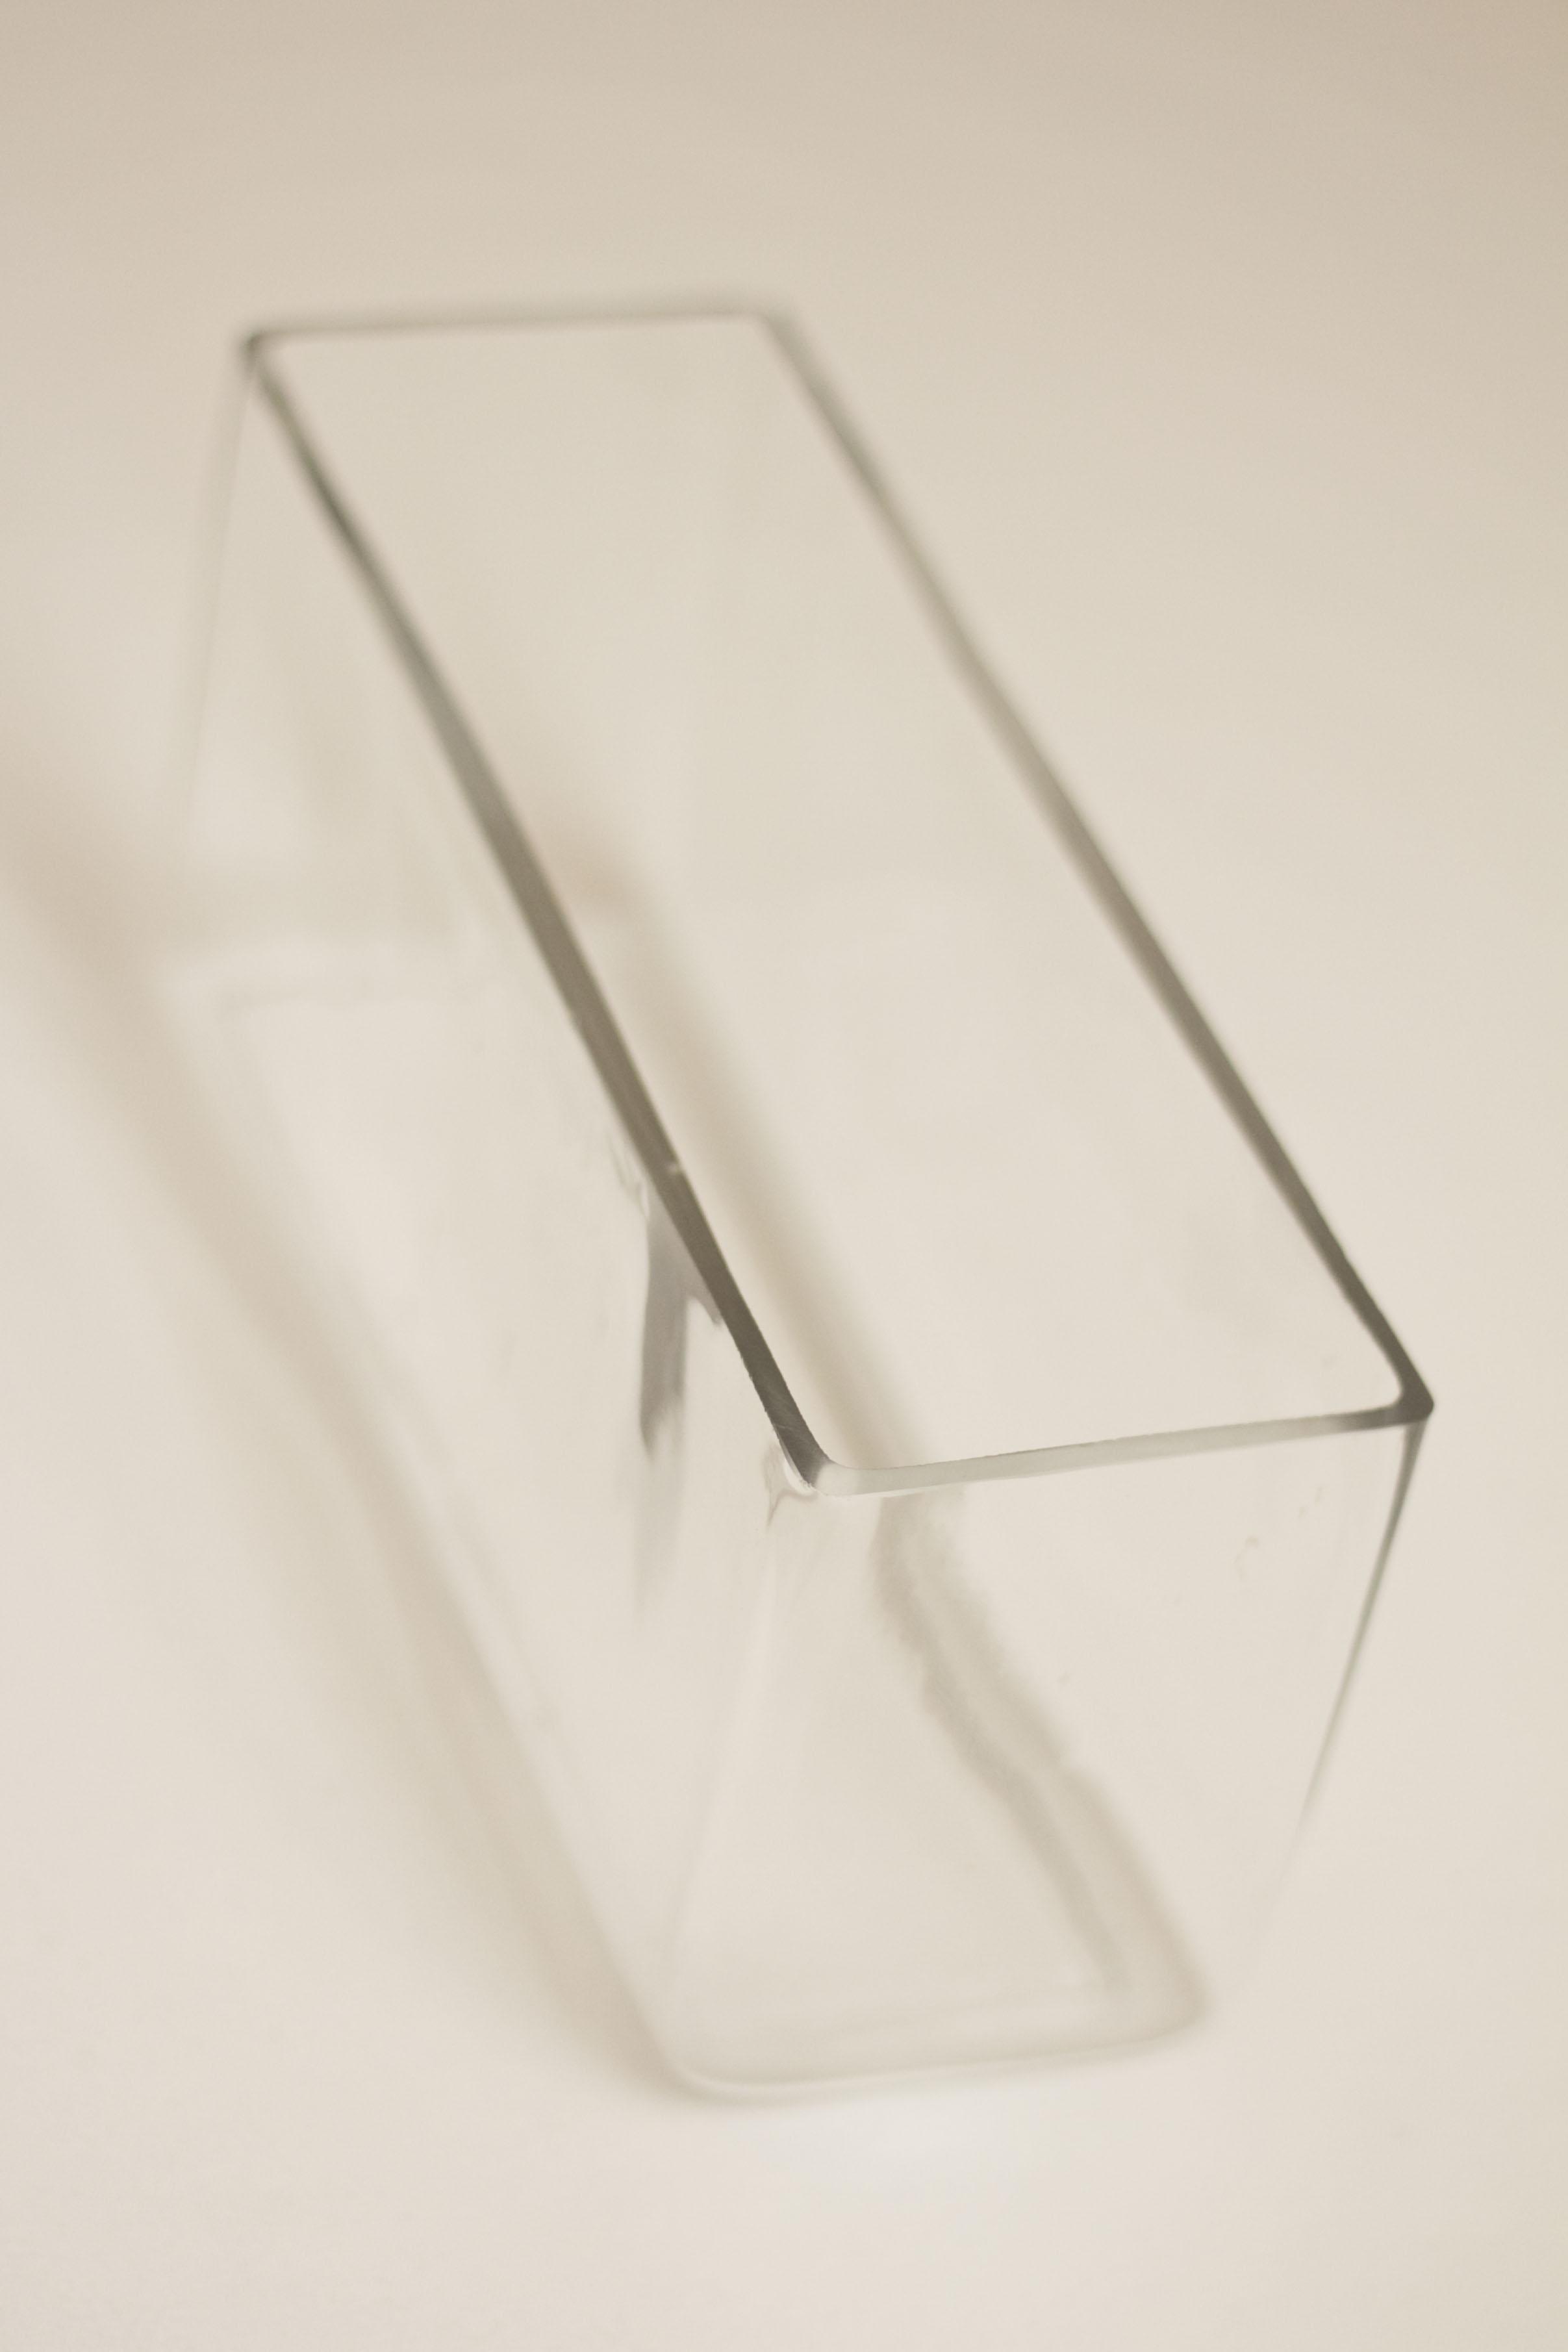 Rock Paper Sugar Events Glassware 017.jpg